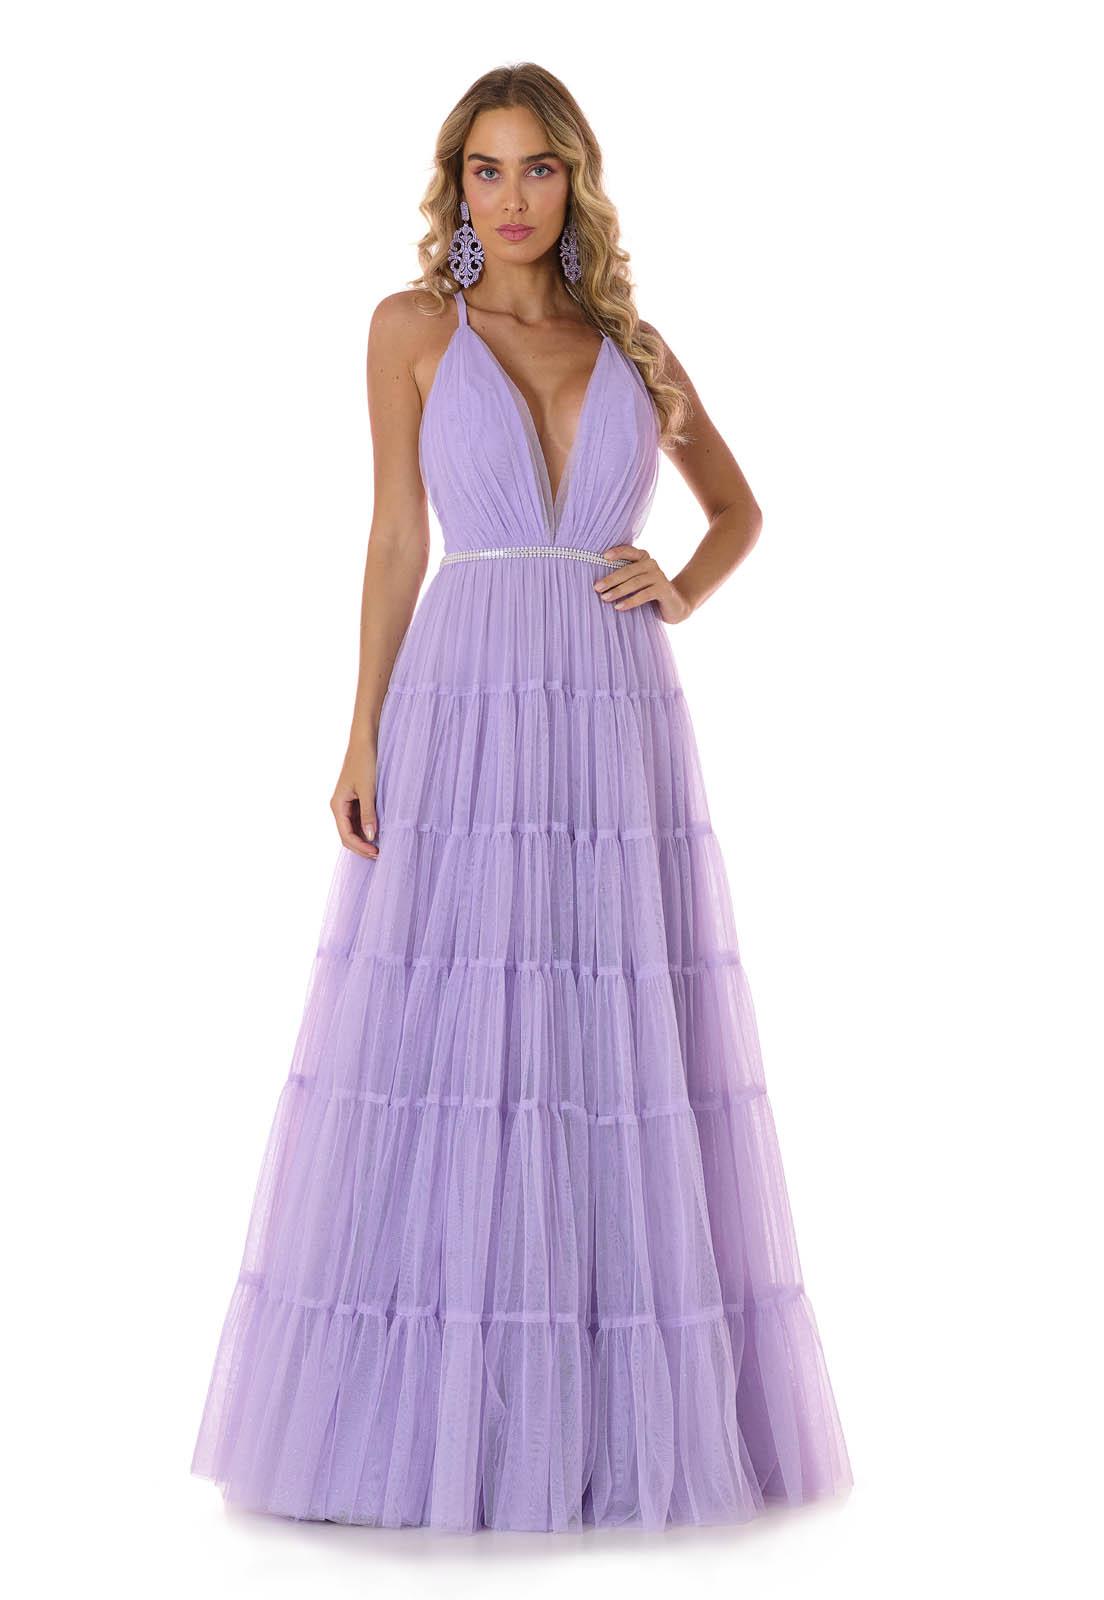 Vestido Longo Camadas Tule Glitter Lilás Lala Dubi